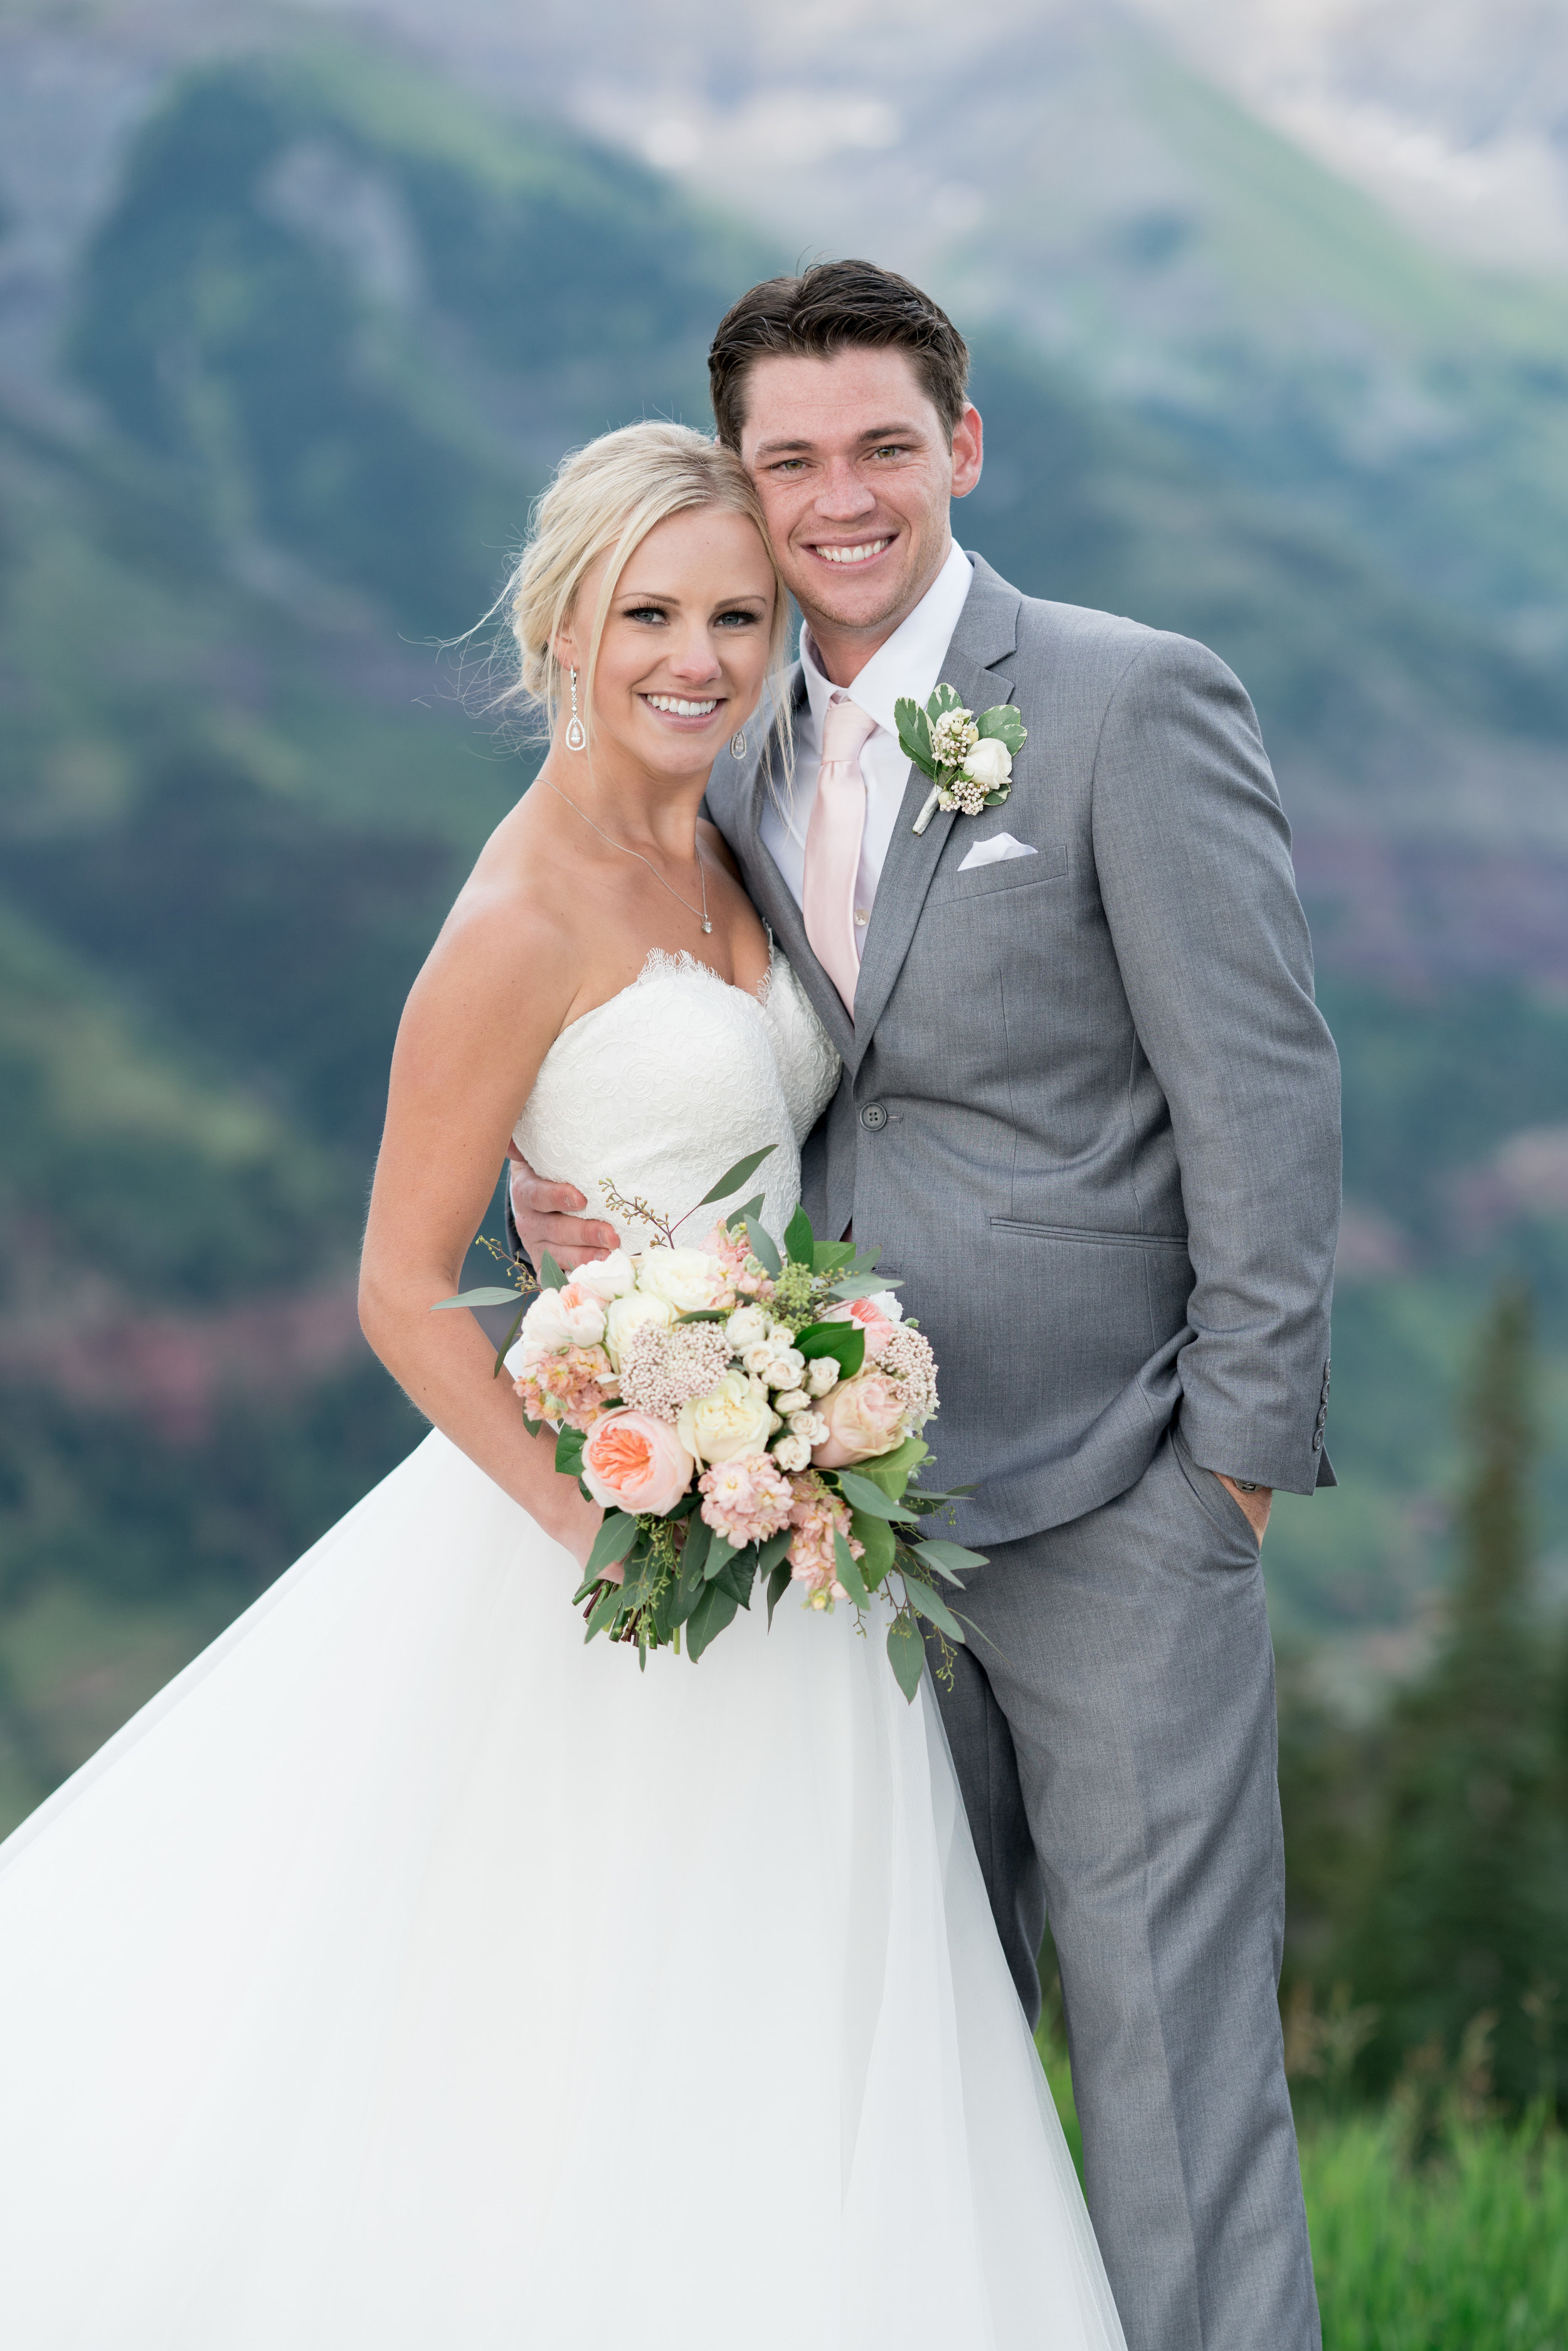 David Manning Photographer Telluride wedding images